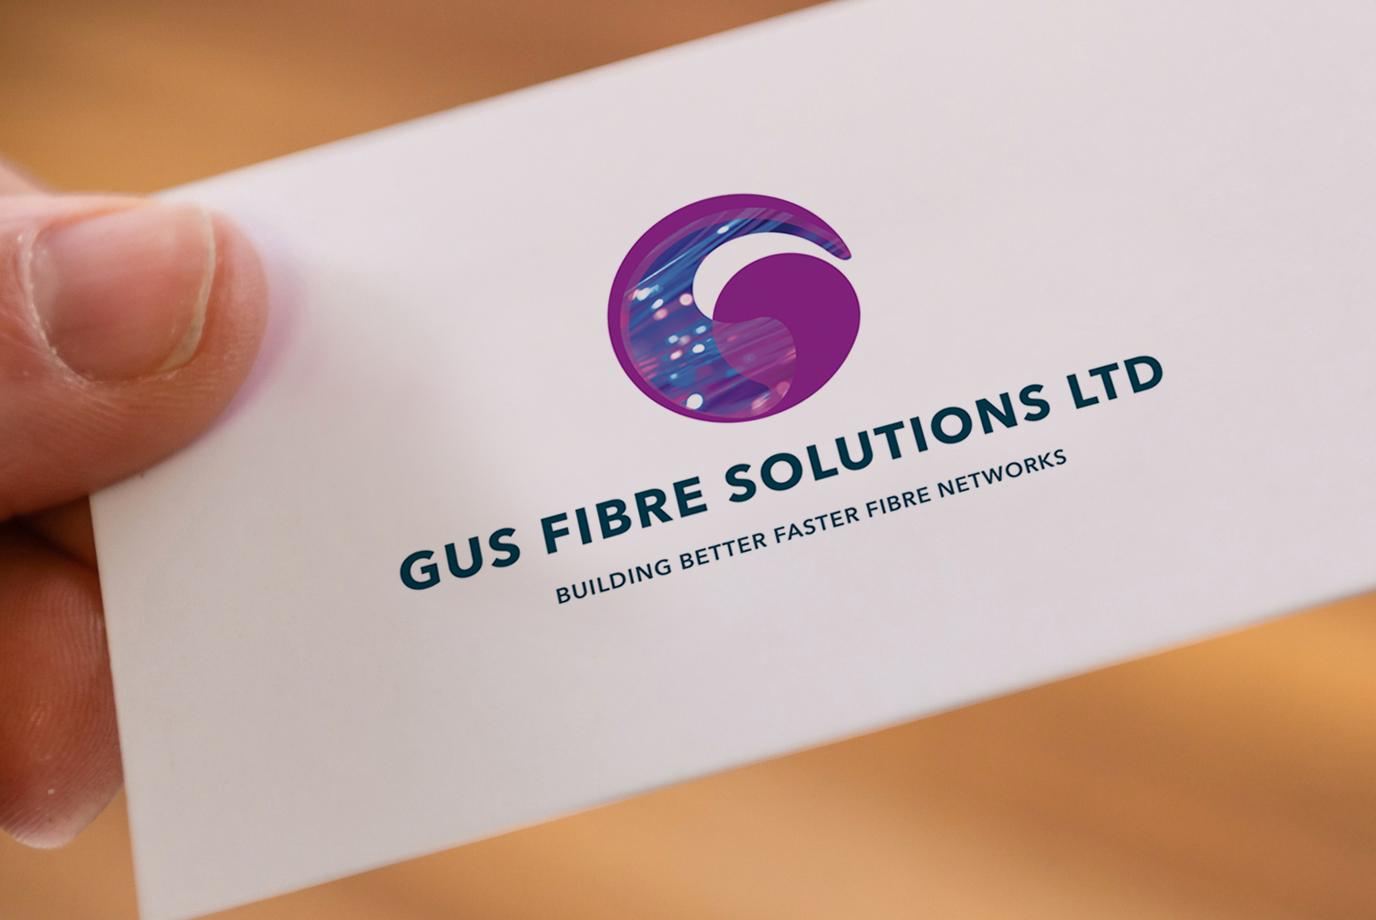 Gus Fibre Optic